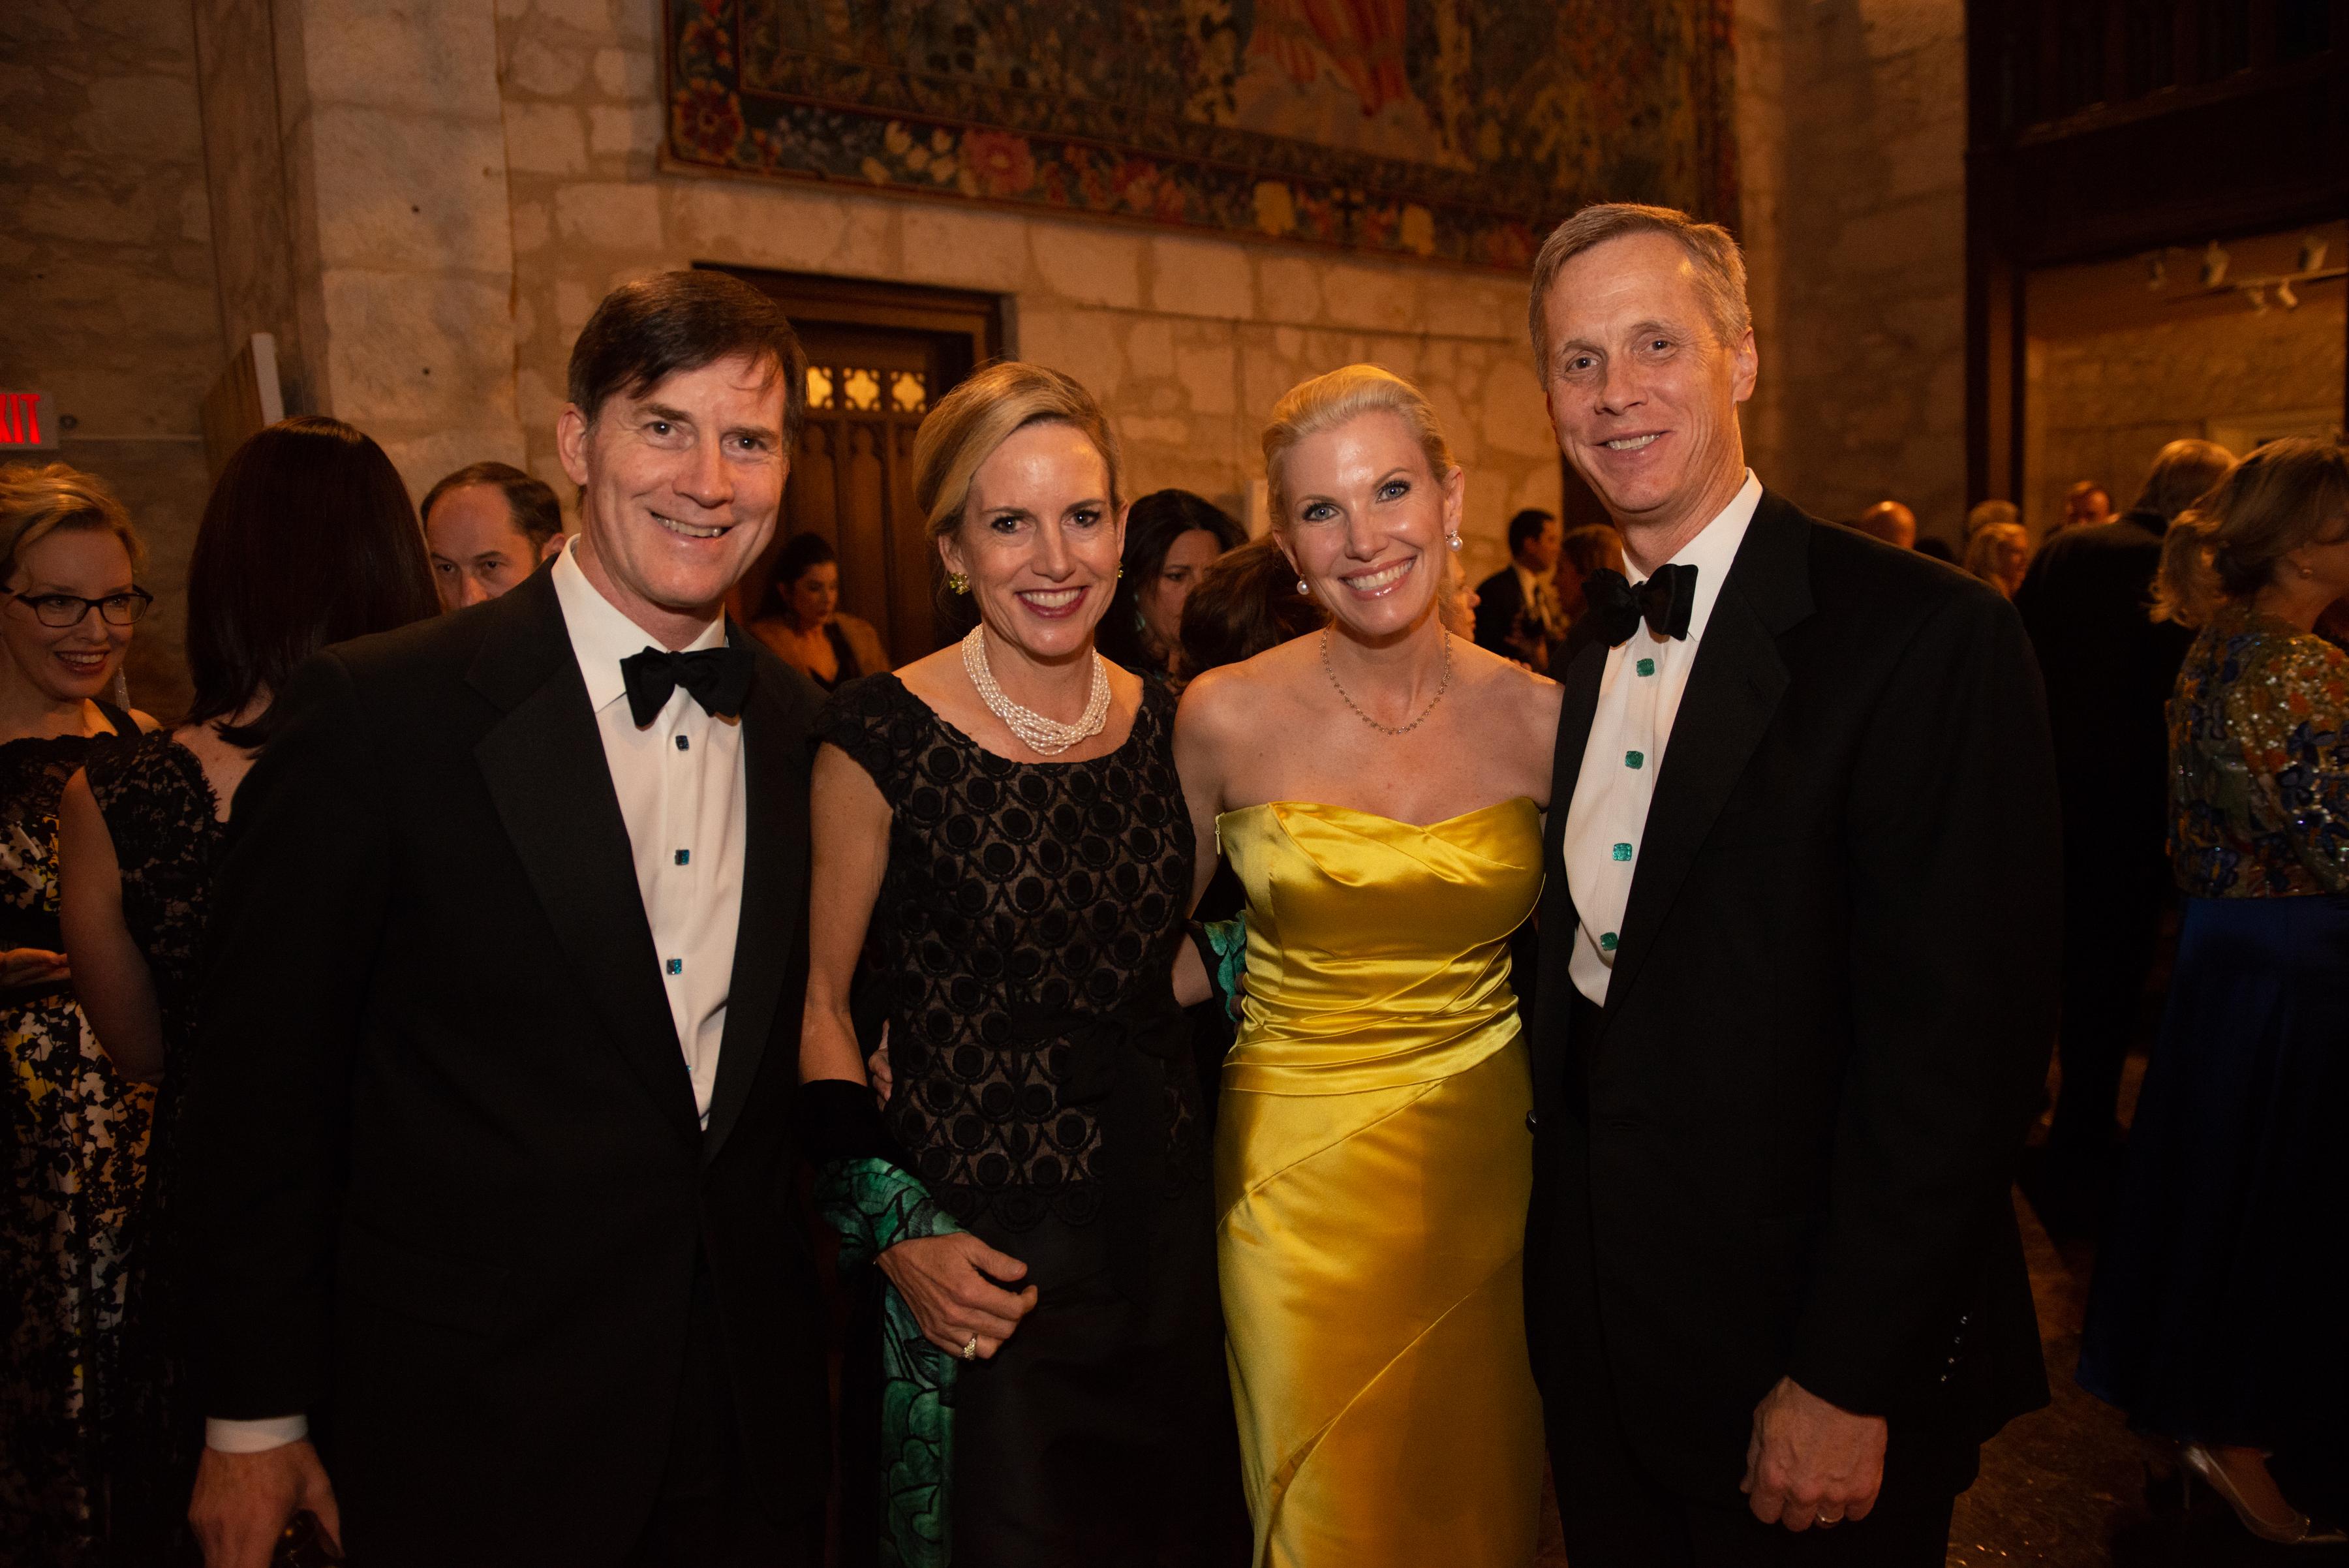 Bob and Jennifer Shemwell & Karen Lee and David Zachry